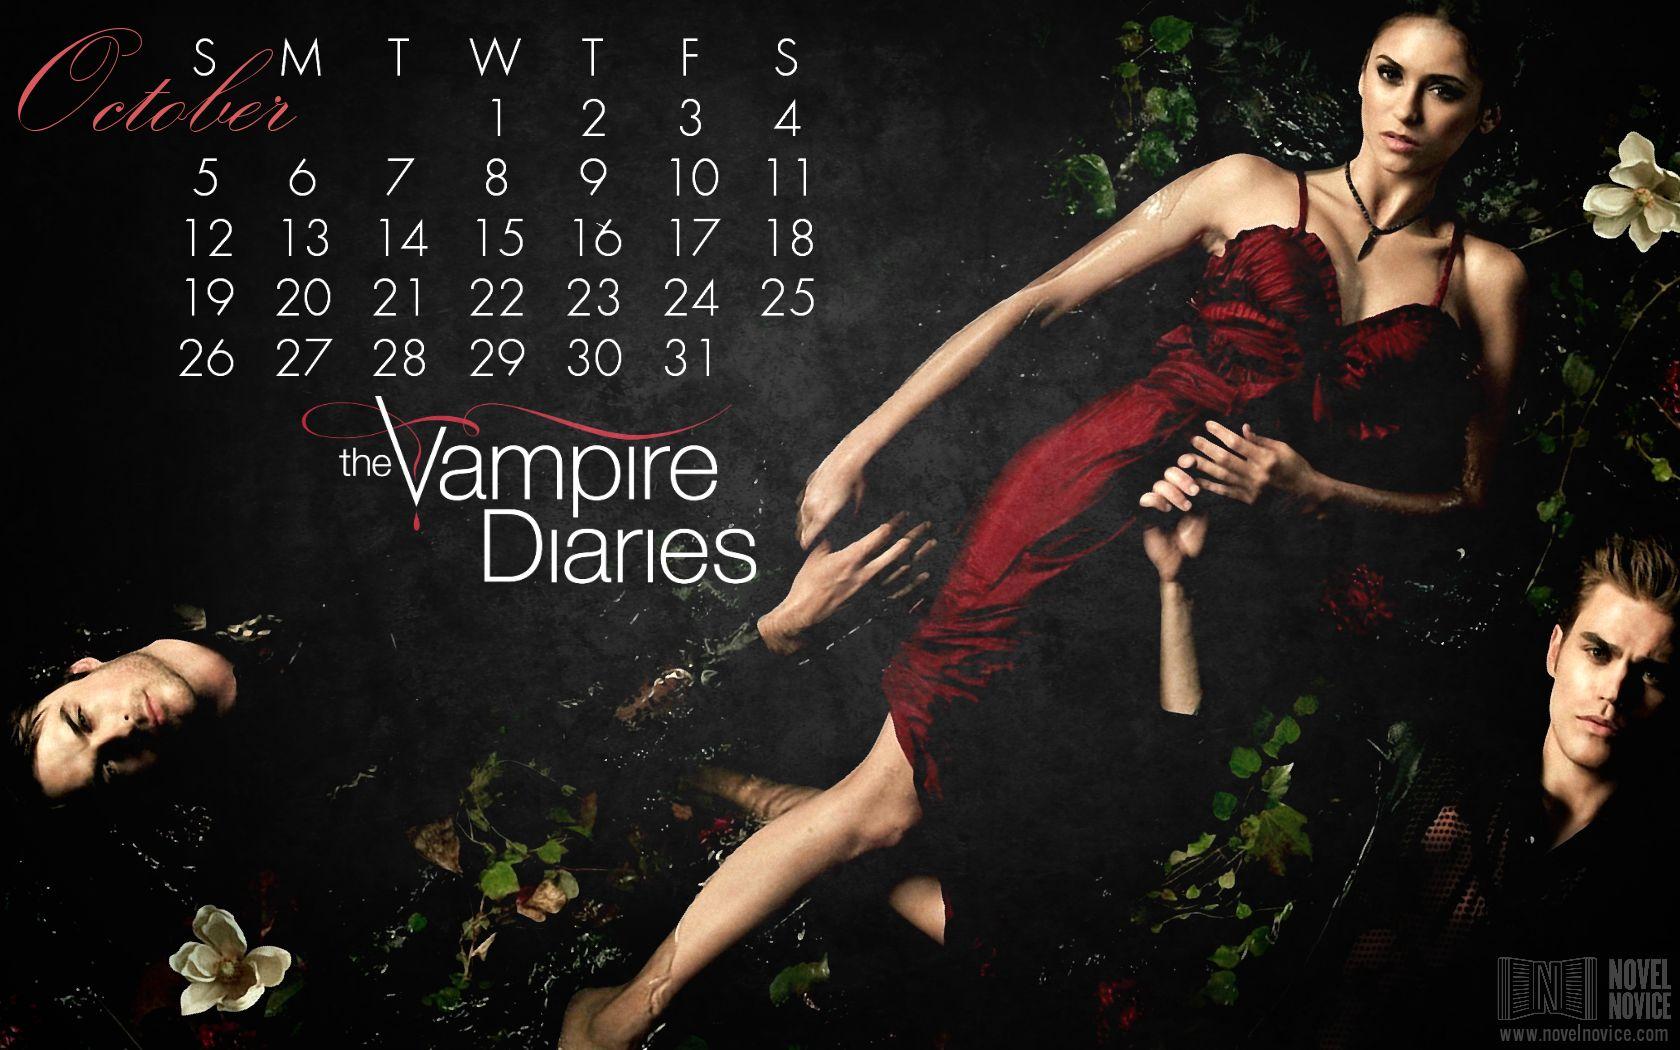 http://novelnovice.files.wordpress.com/2013/12/oct2014_vampire-diaries.jpg